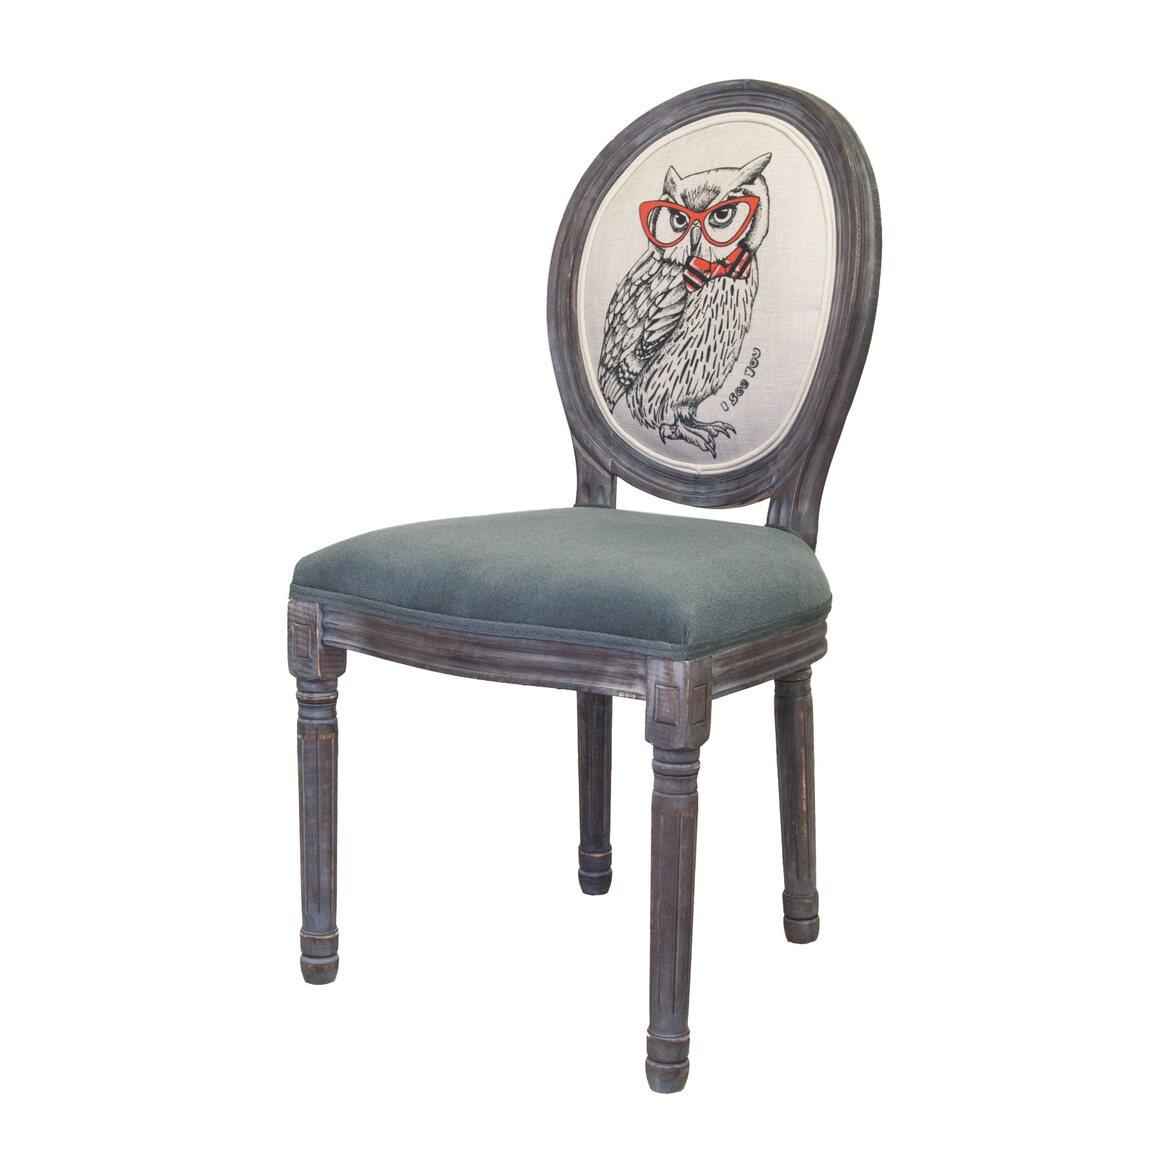 Стул Volker owl ver. 2 4 | Обеденные стулья Kingsby